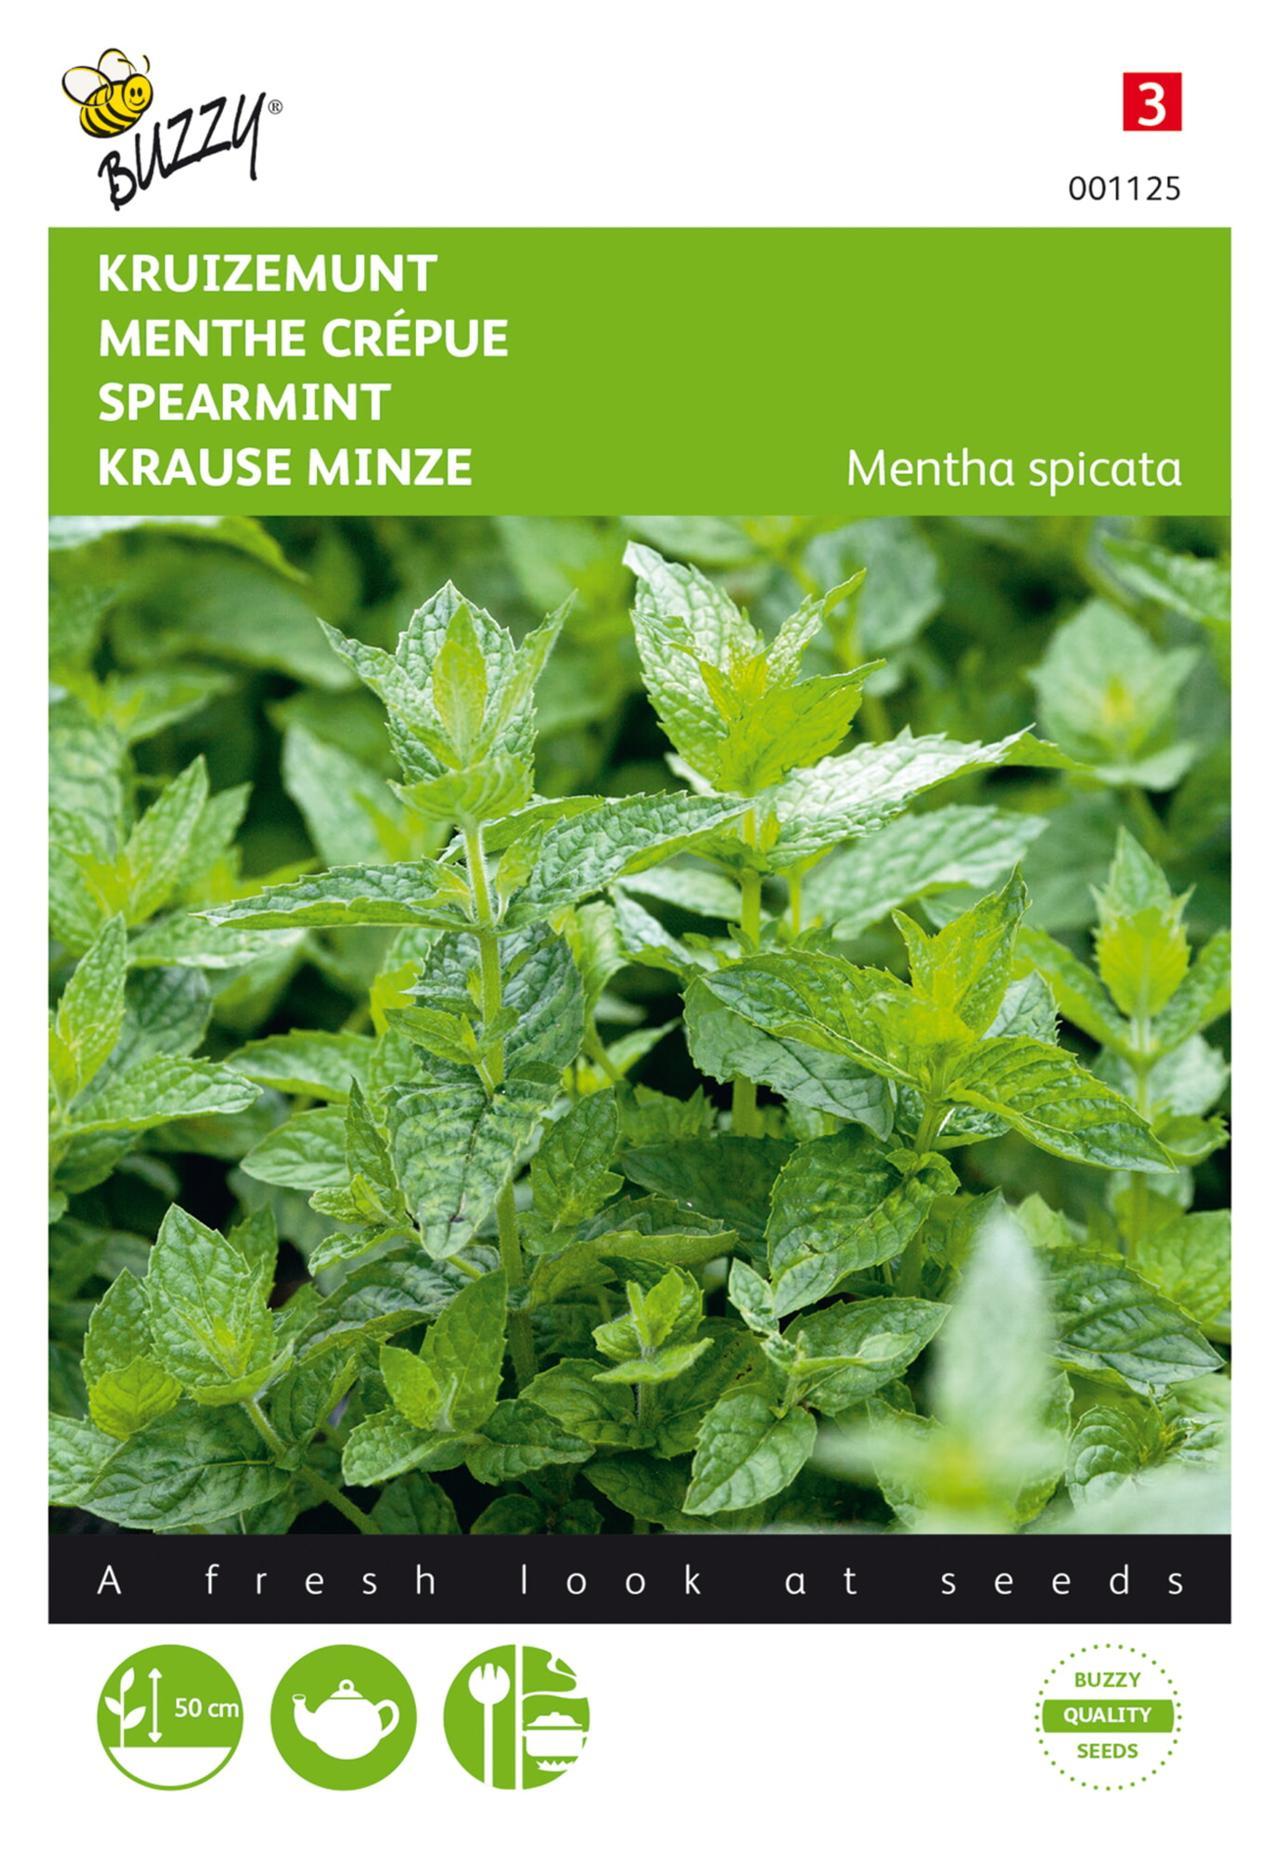 Mentha spicata plant